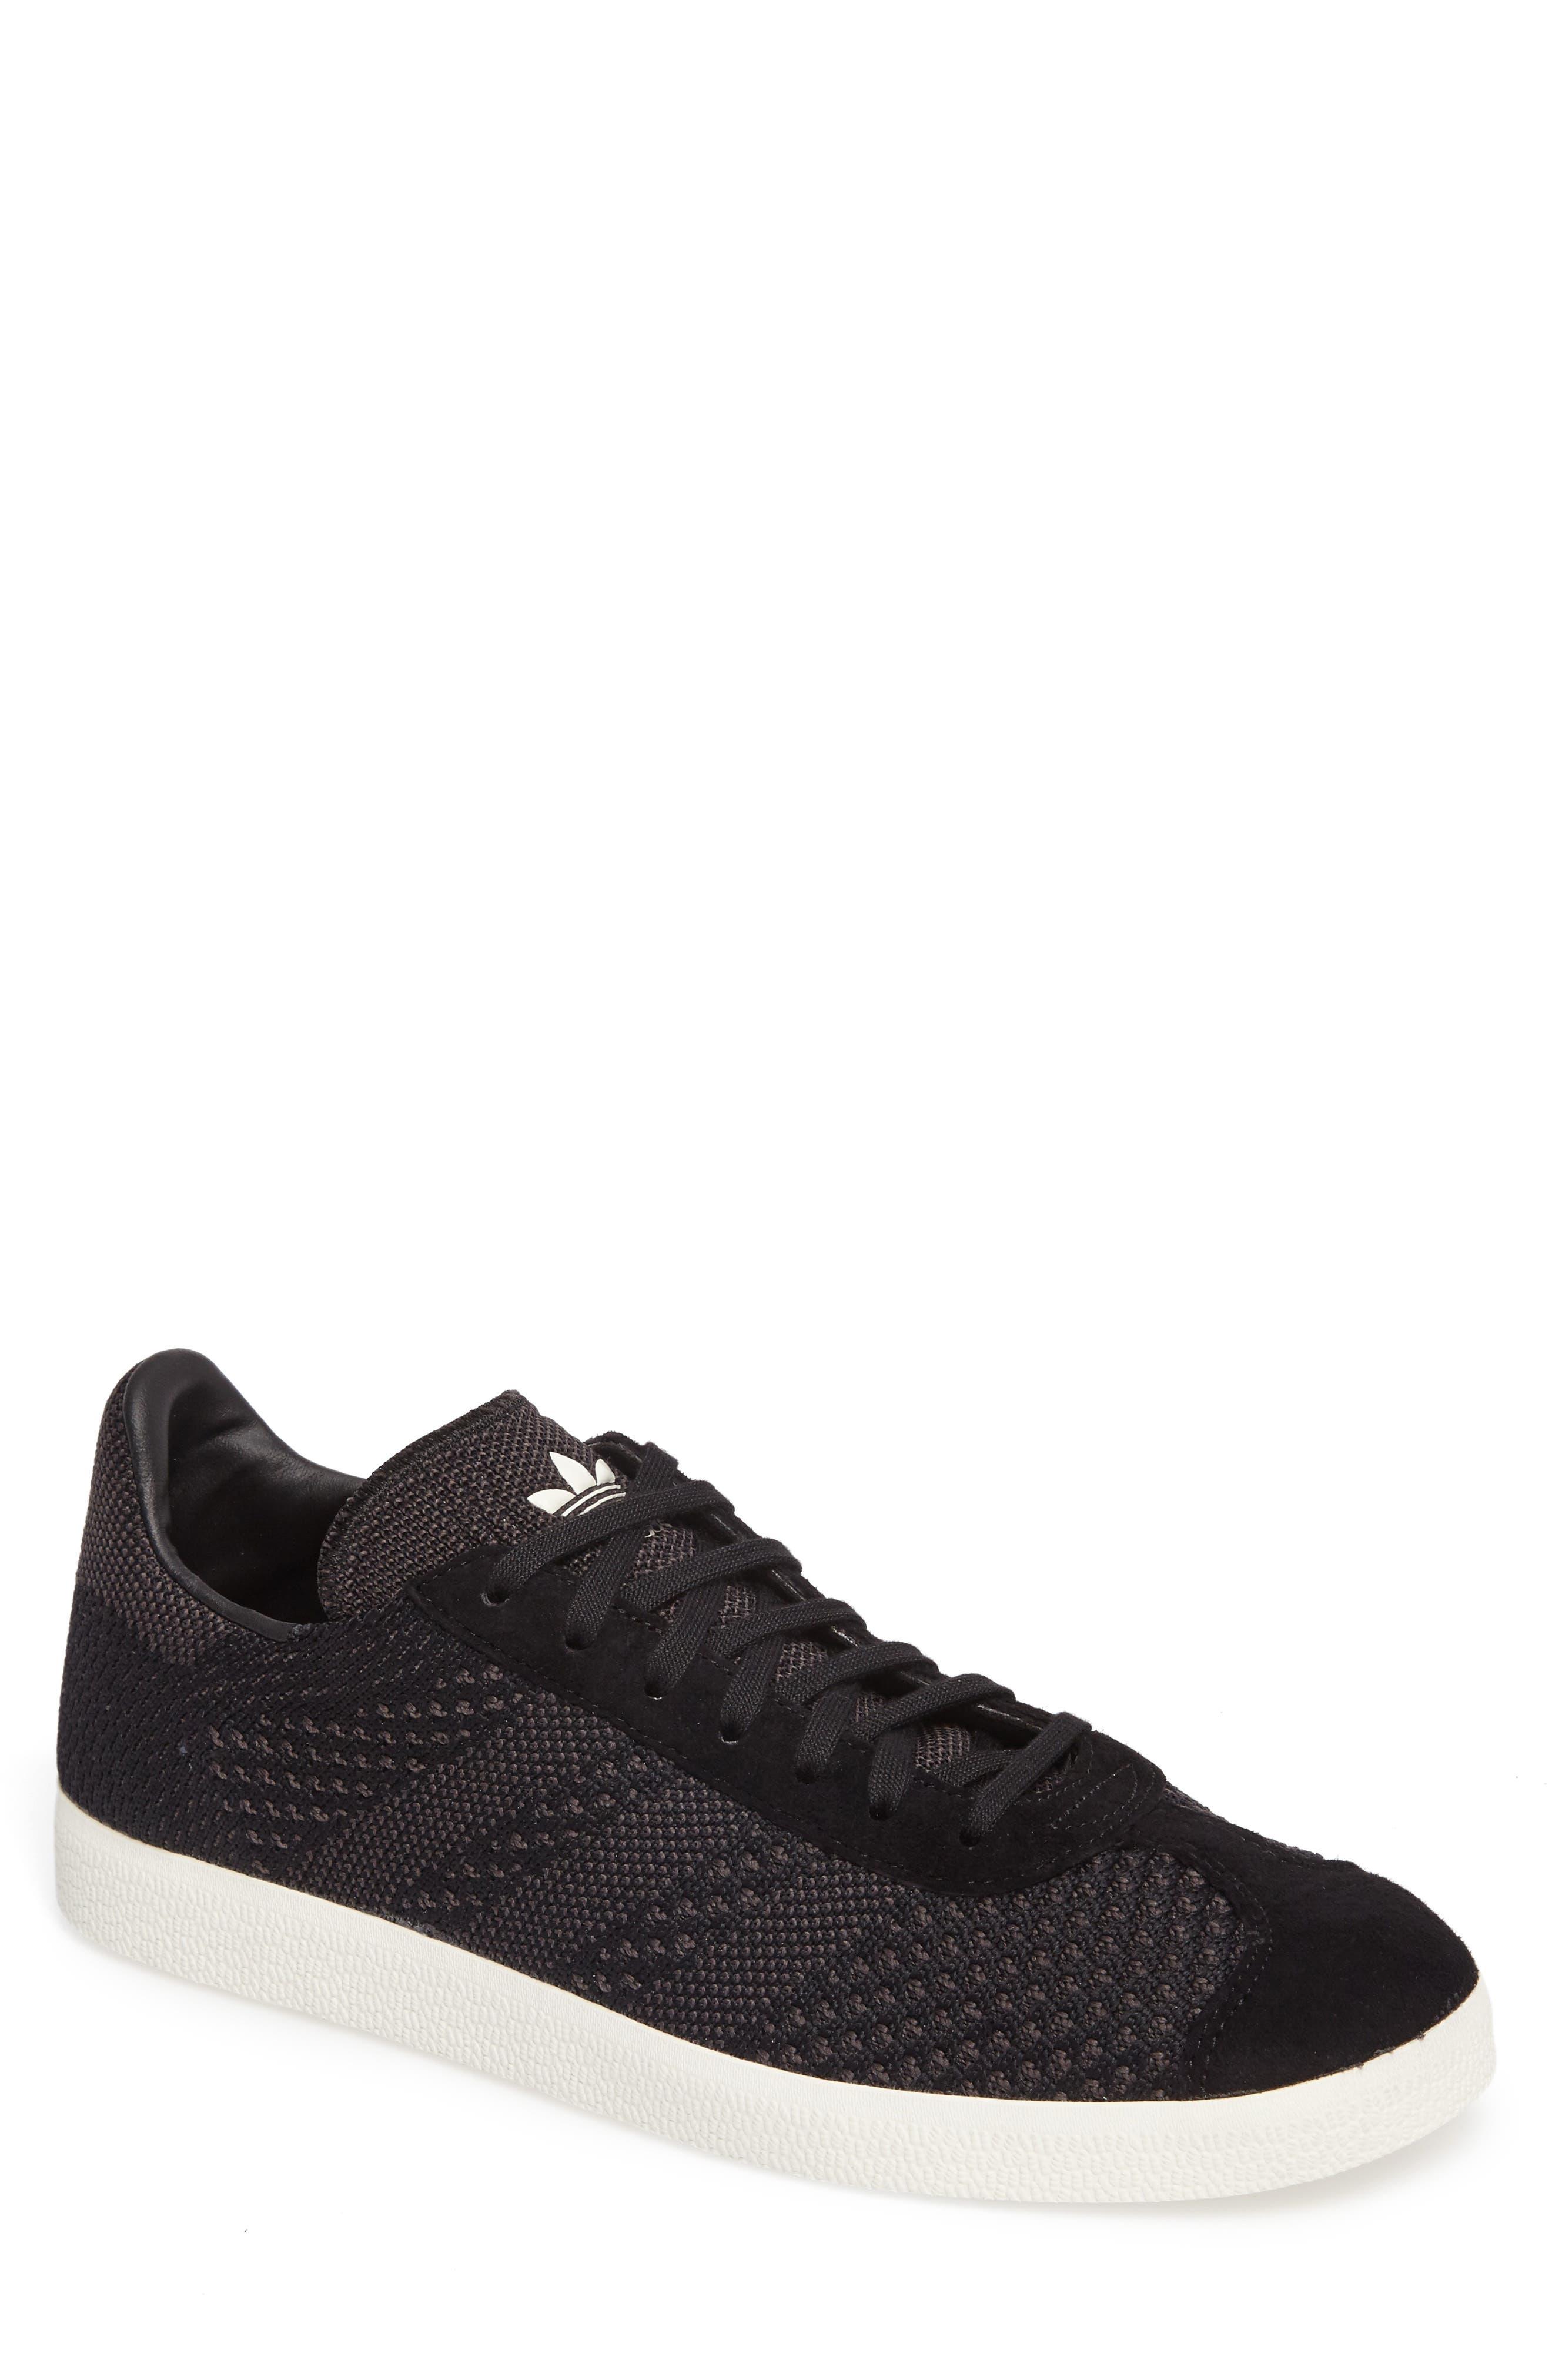 adidas Gazelle Primeknit Sneaker (Men)